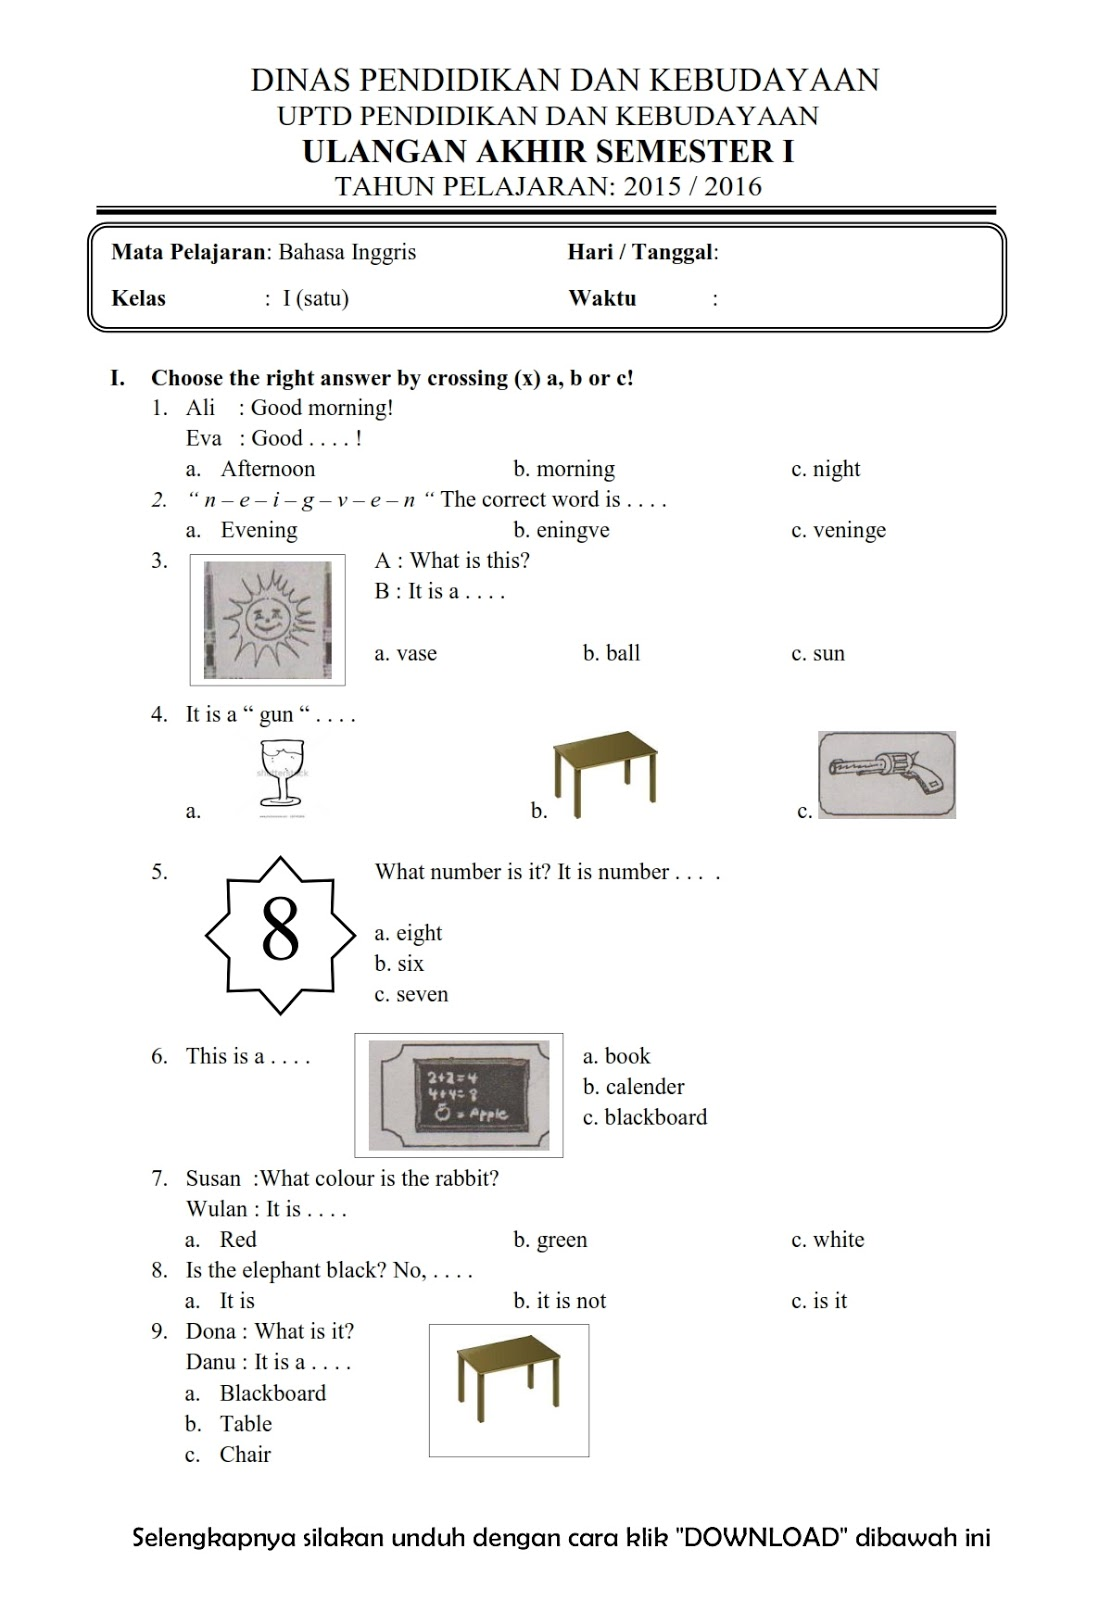 Worksheet Bahasa Indonesia Kelas 2 Printable Worksheets And Activities For Teachers Parents Tutors And Homeschool Families